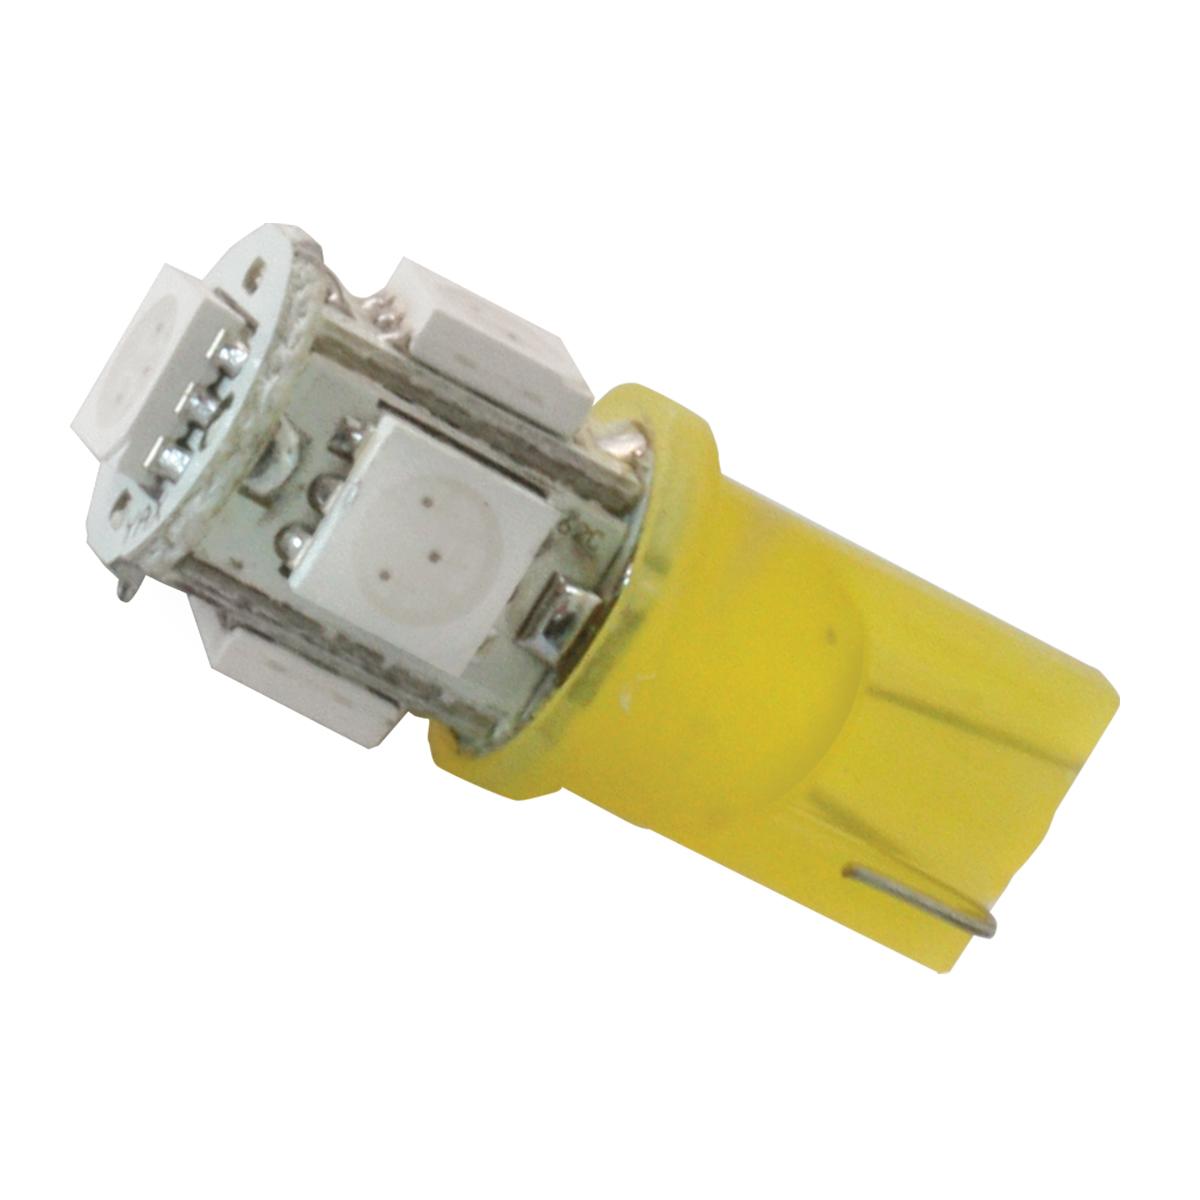 74910 Amber 194/168 Tower Style 5 LED Light Bulb